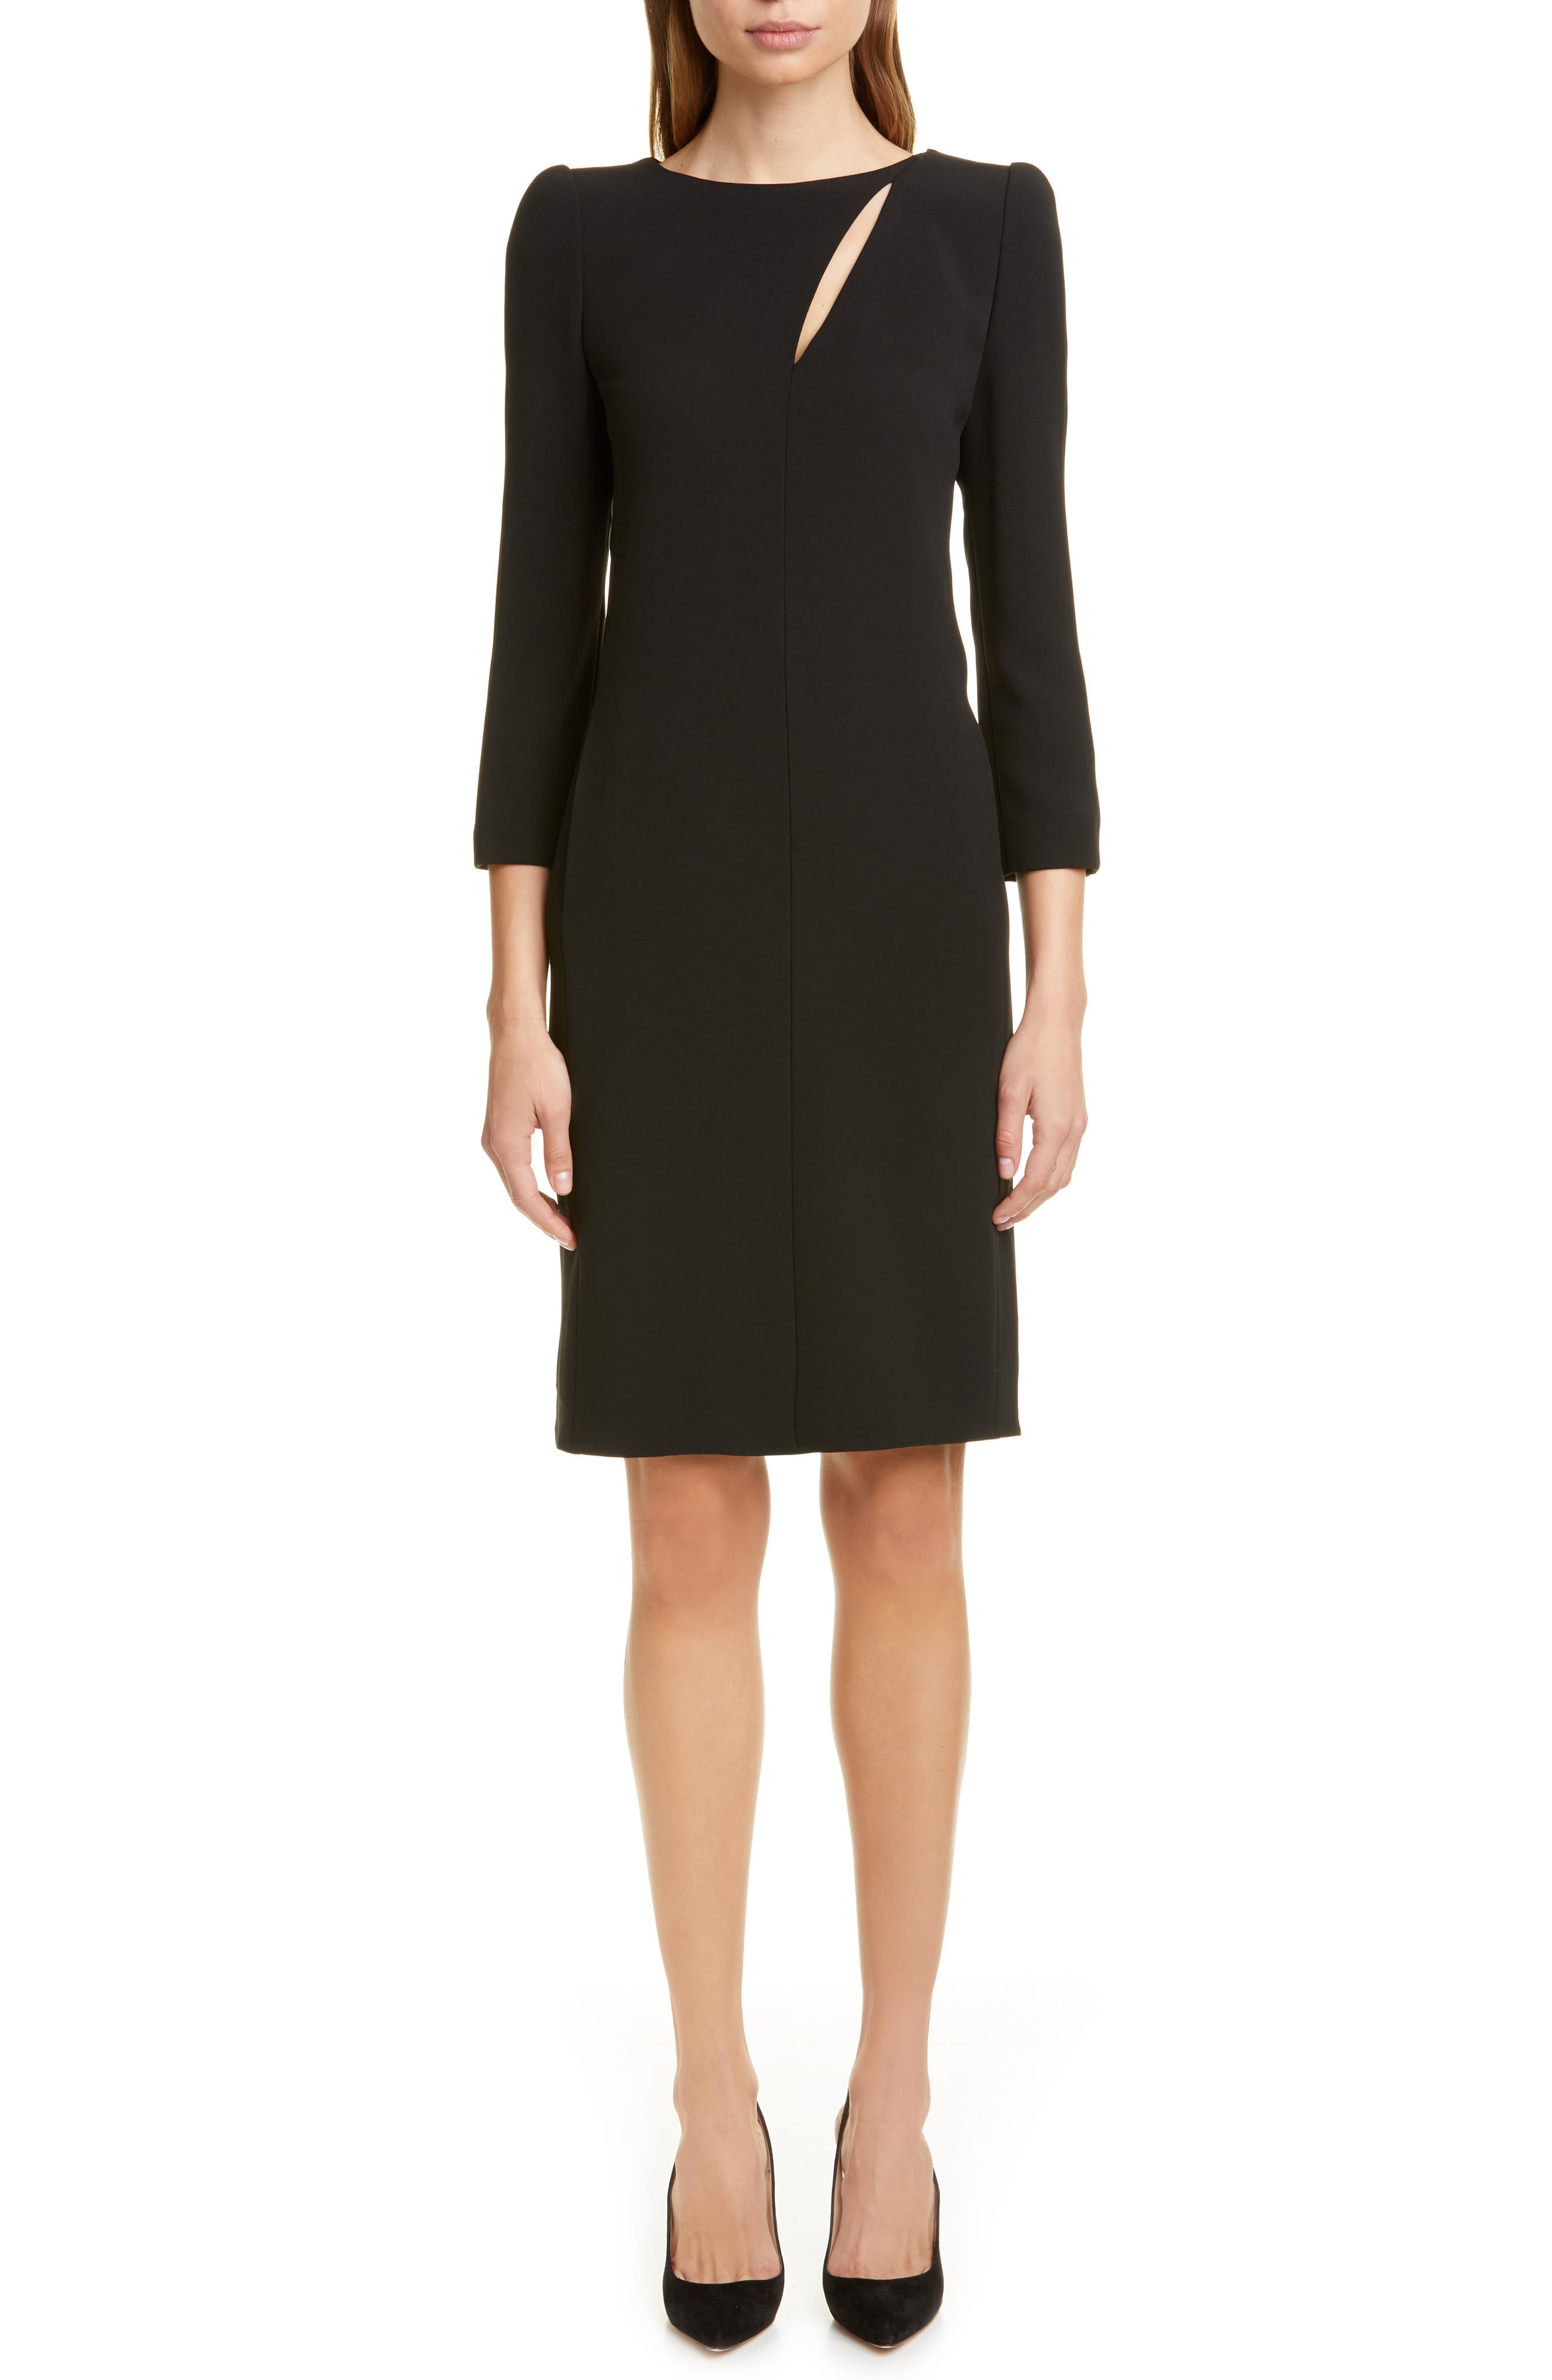 Emporio Armani Slit Detail Cady Dress, US / 42 IT - Black